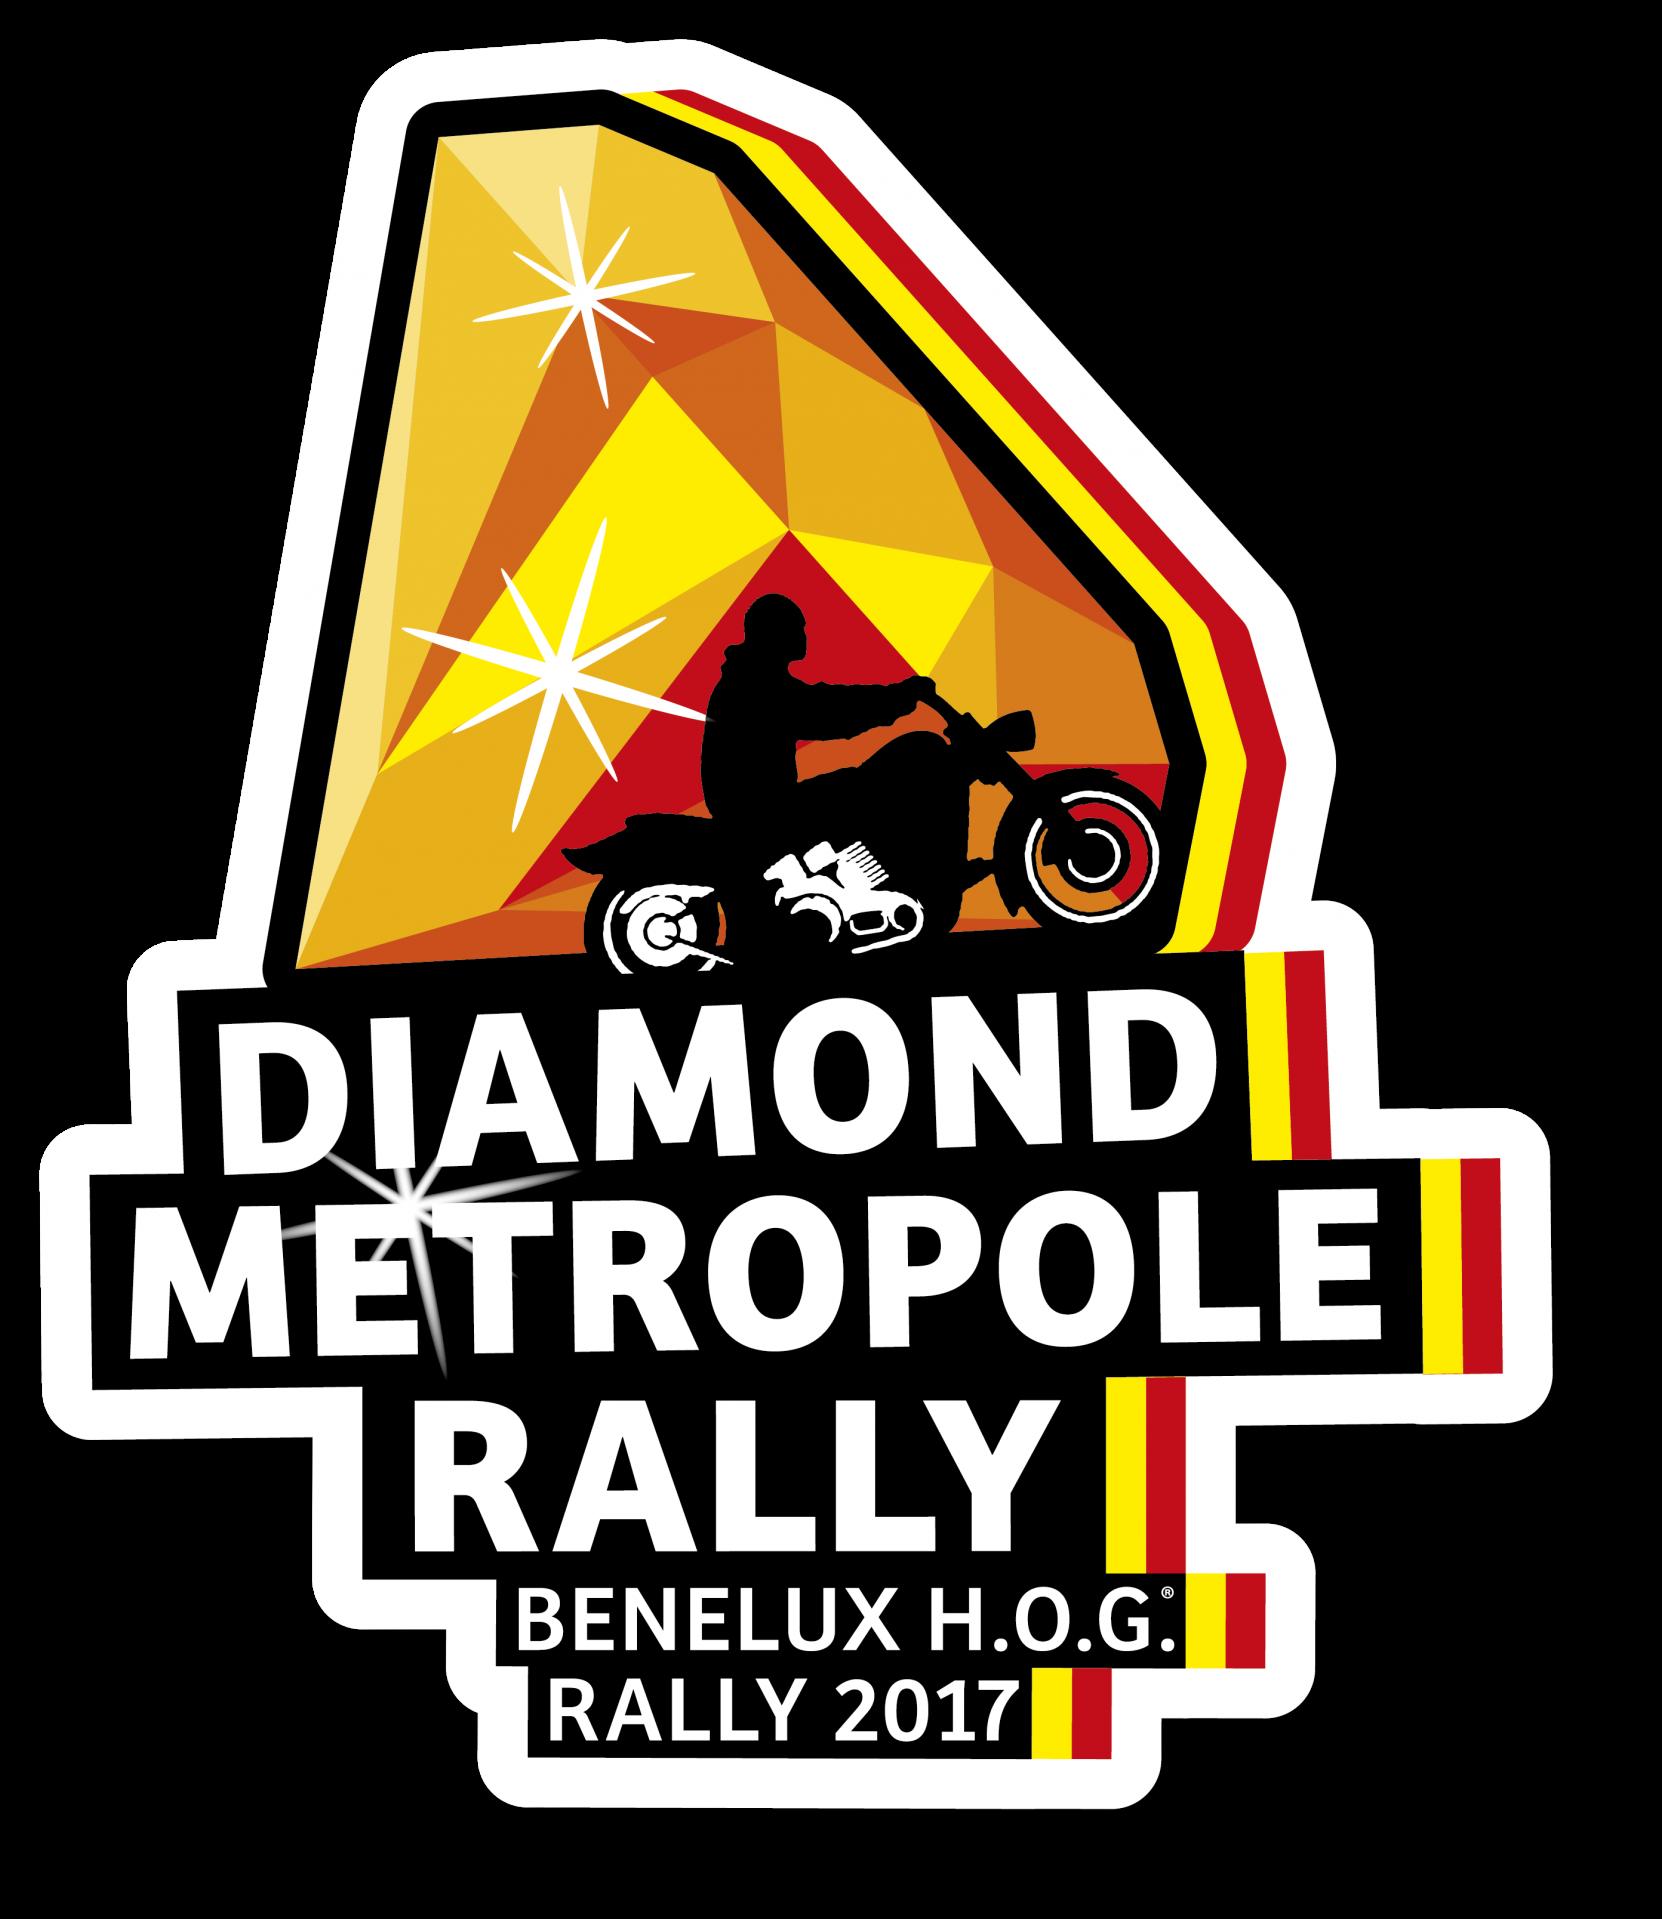 Hog rally 2017 logo